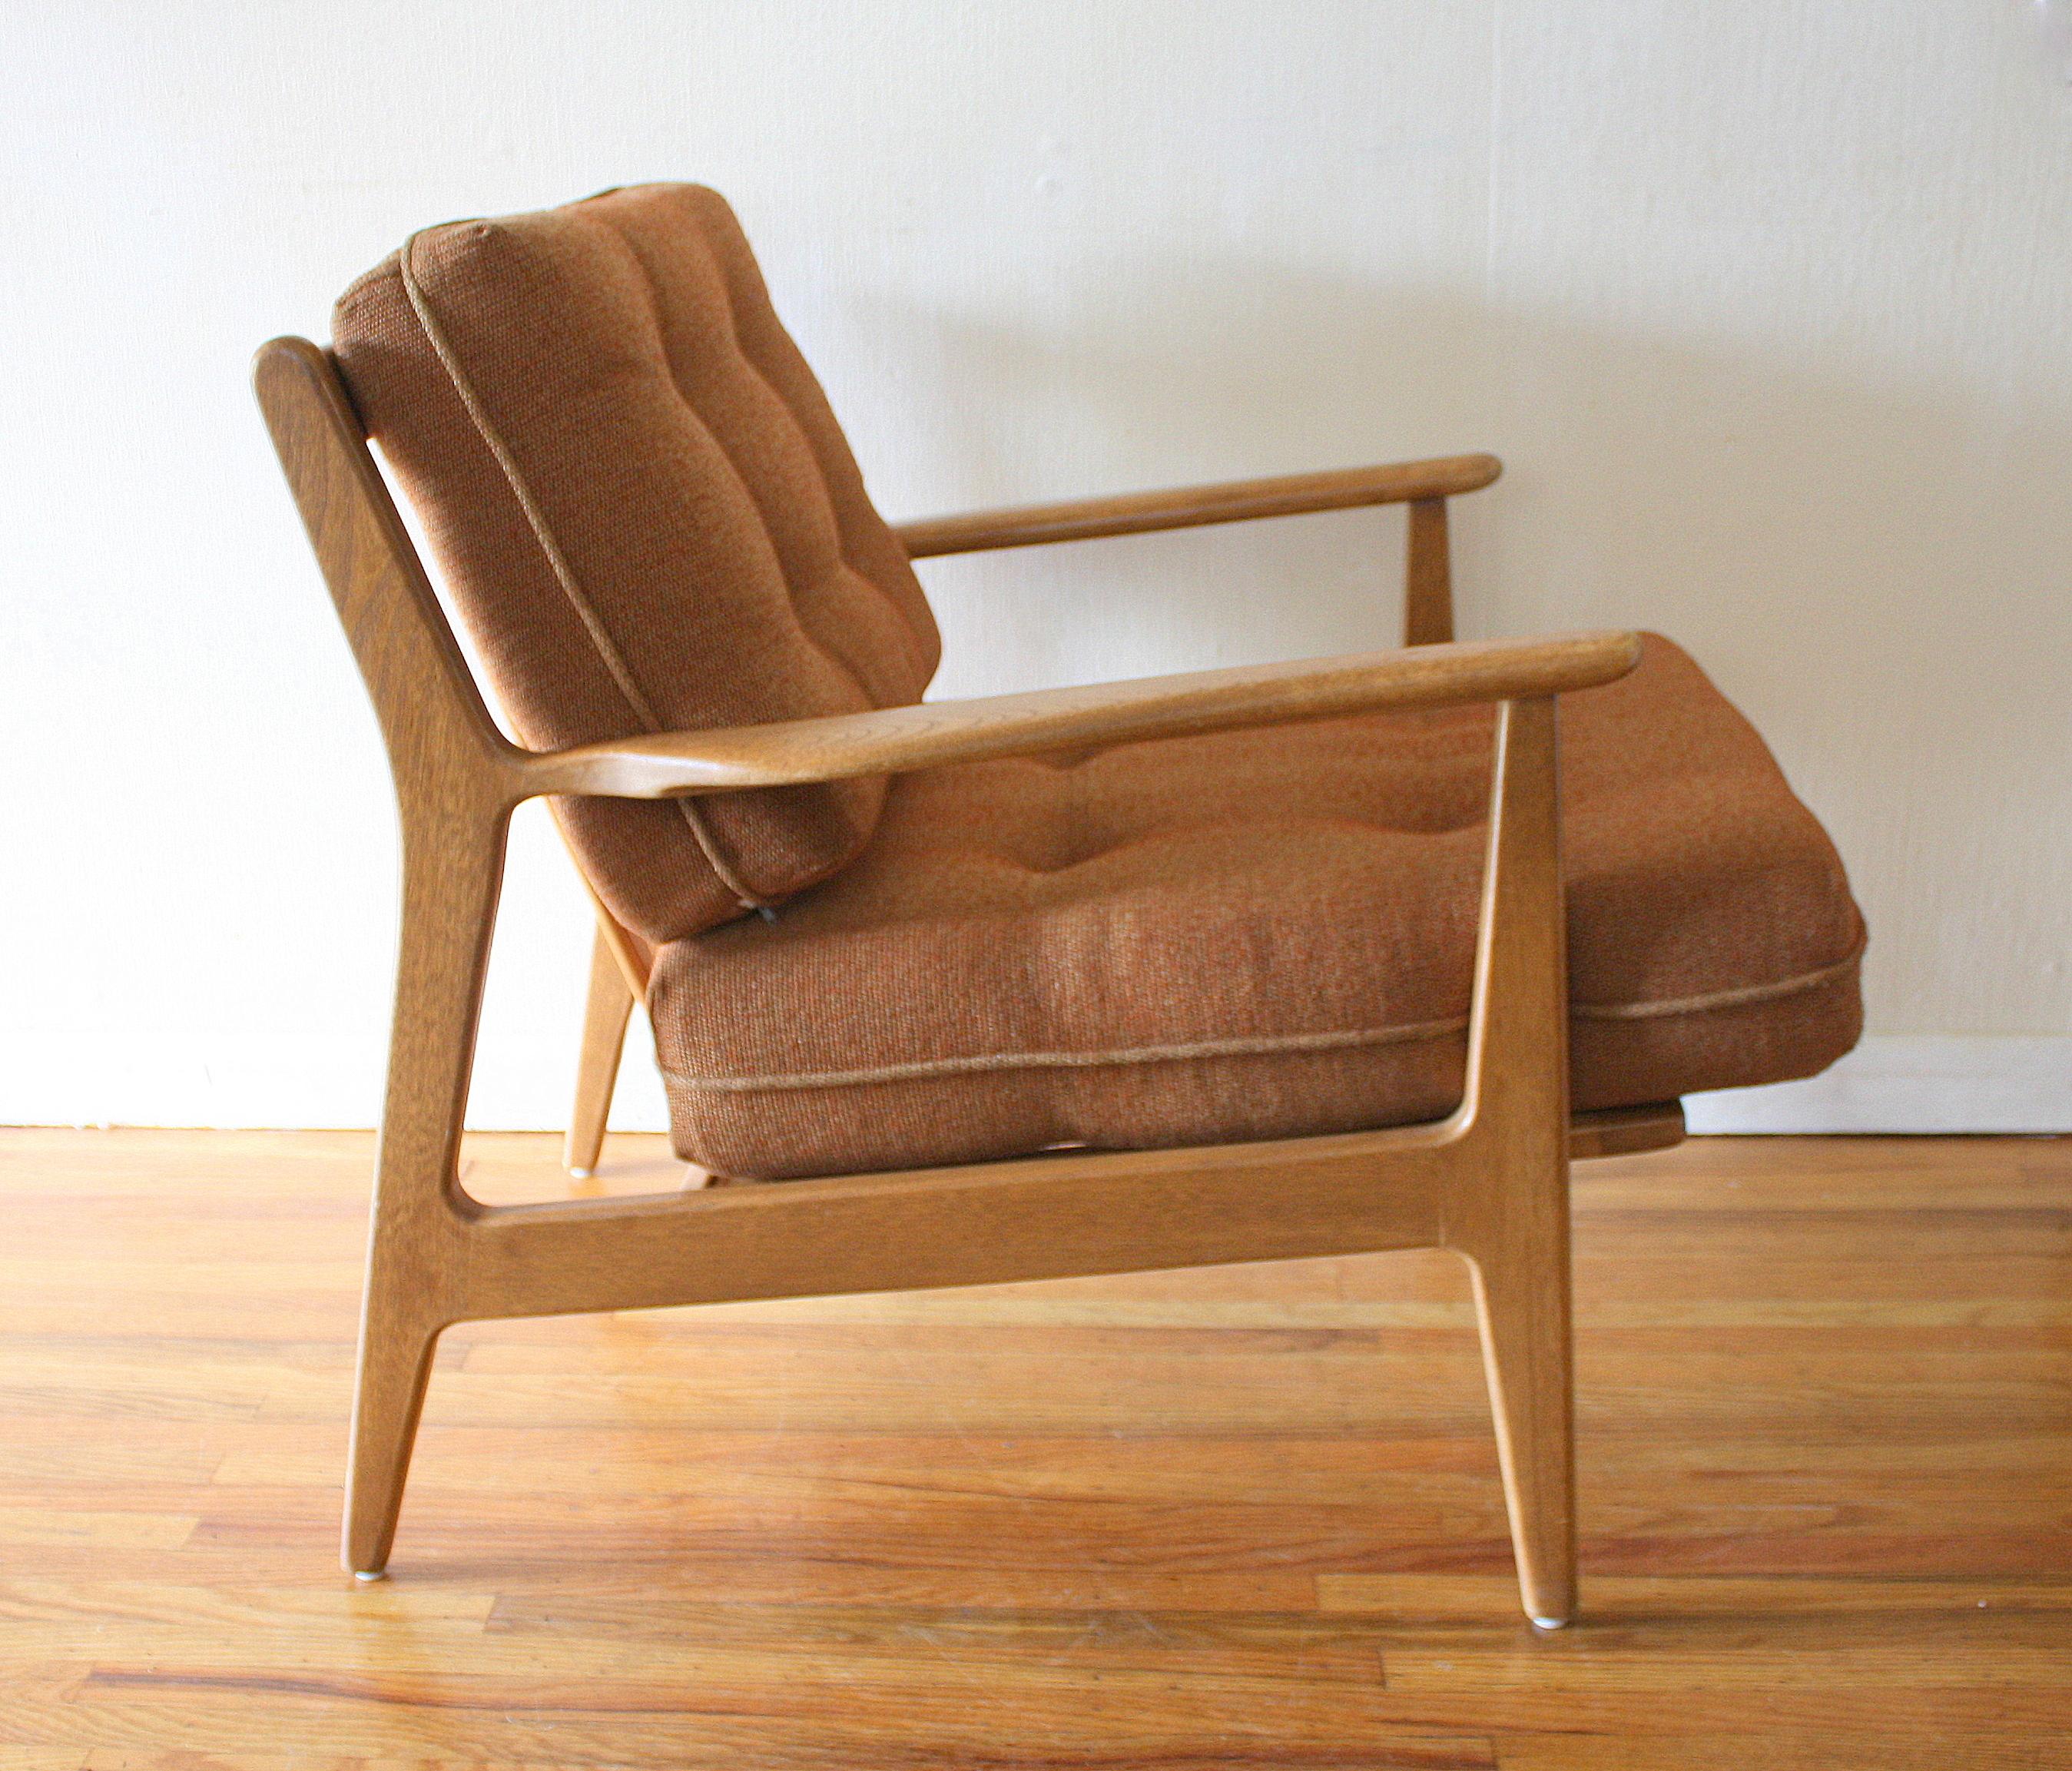 Fullsize Of Mid Century Modern Chairs